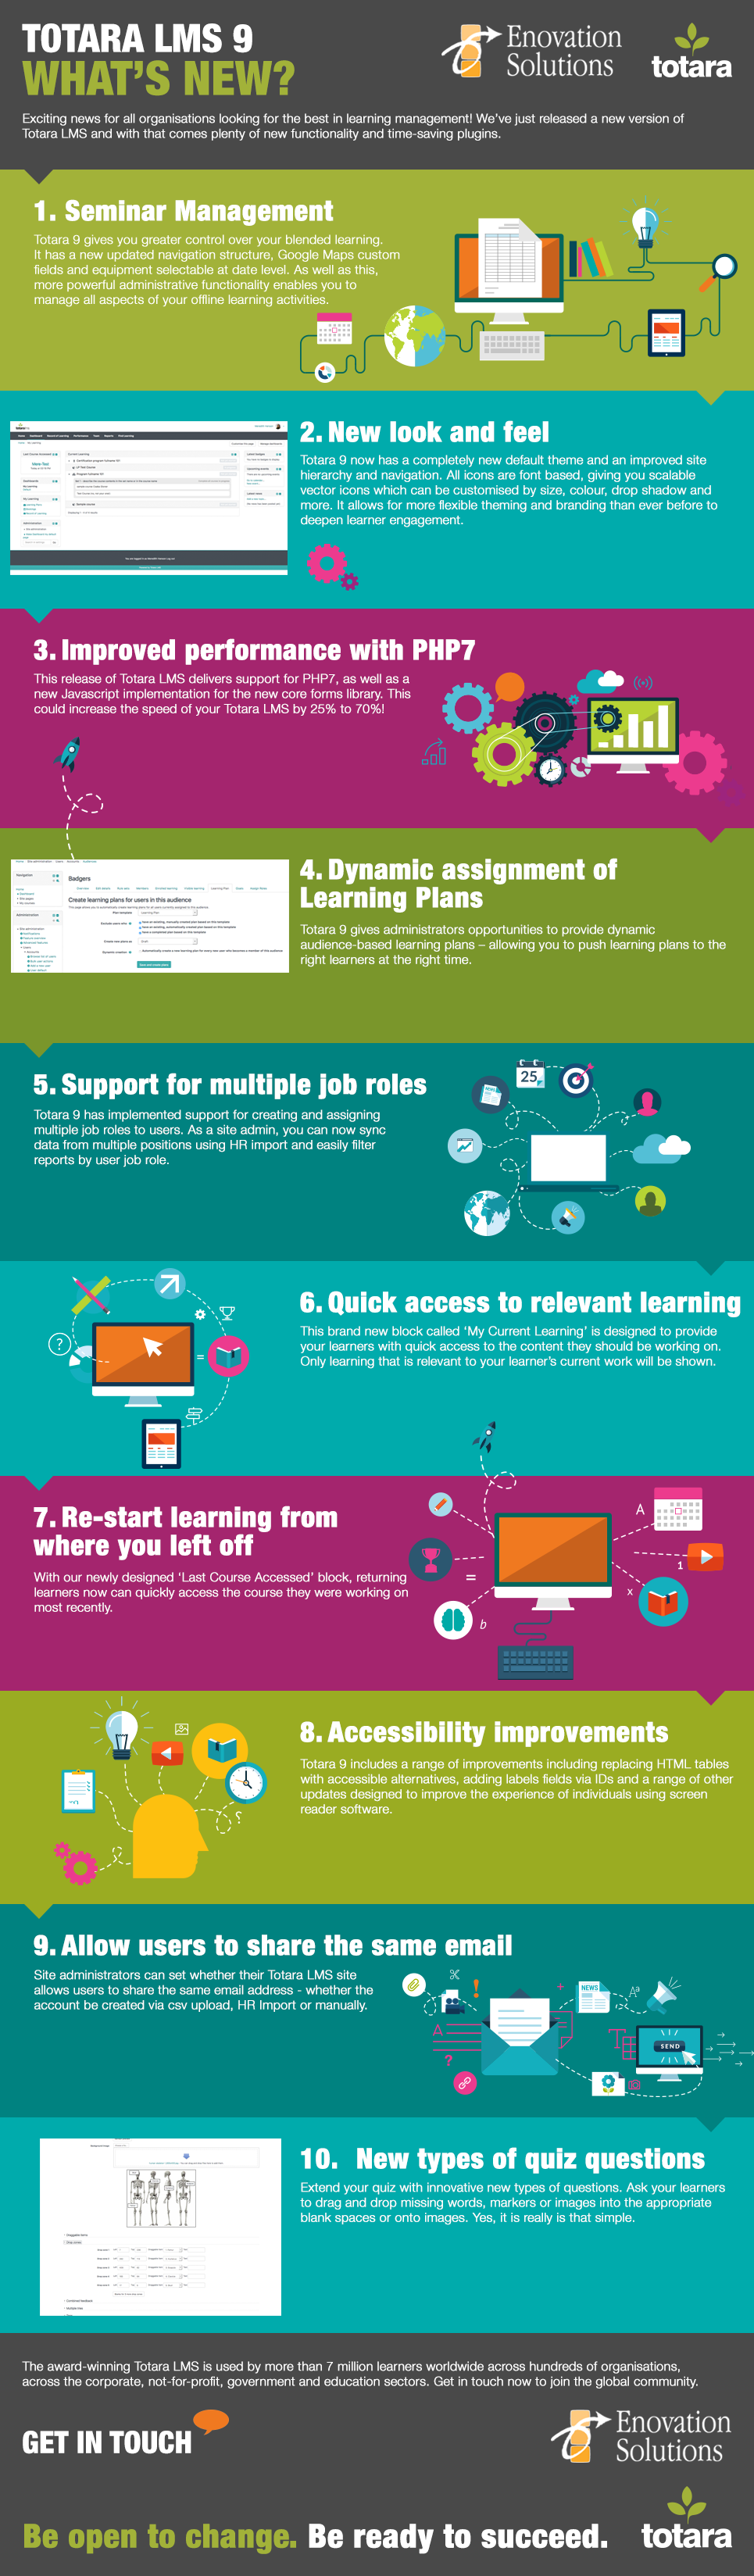 totara-9_infographic